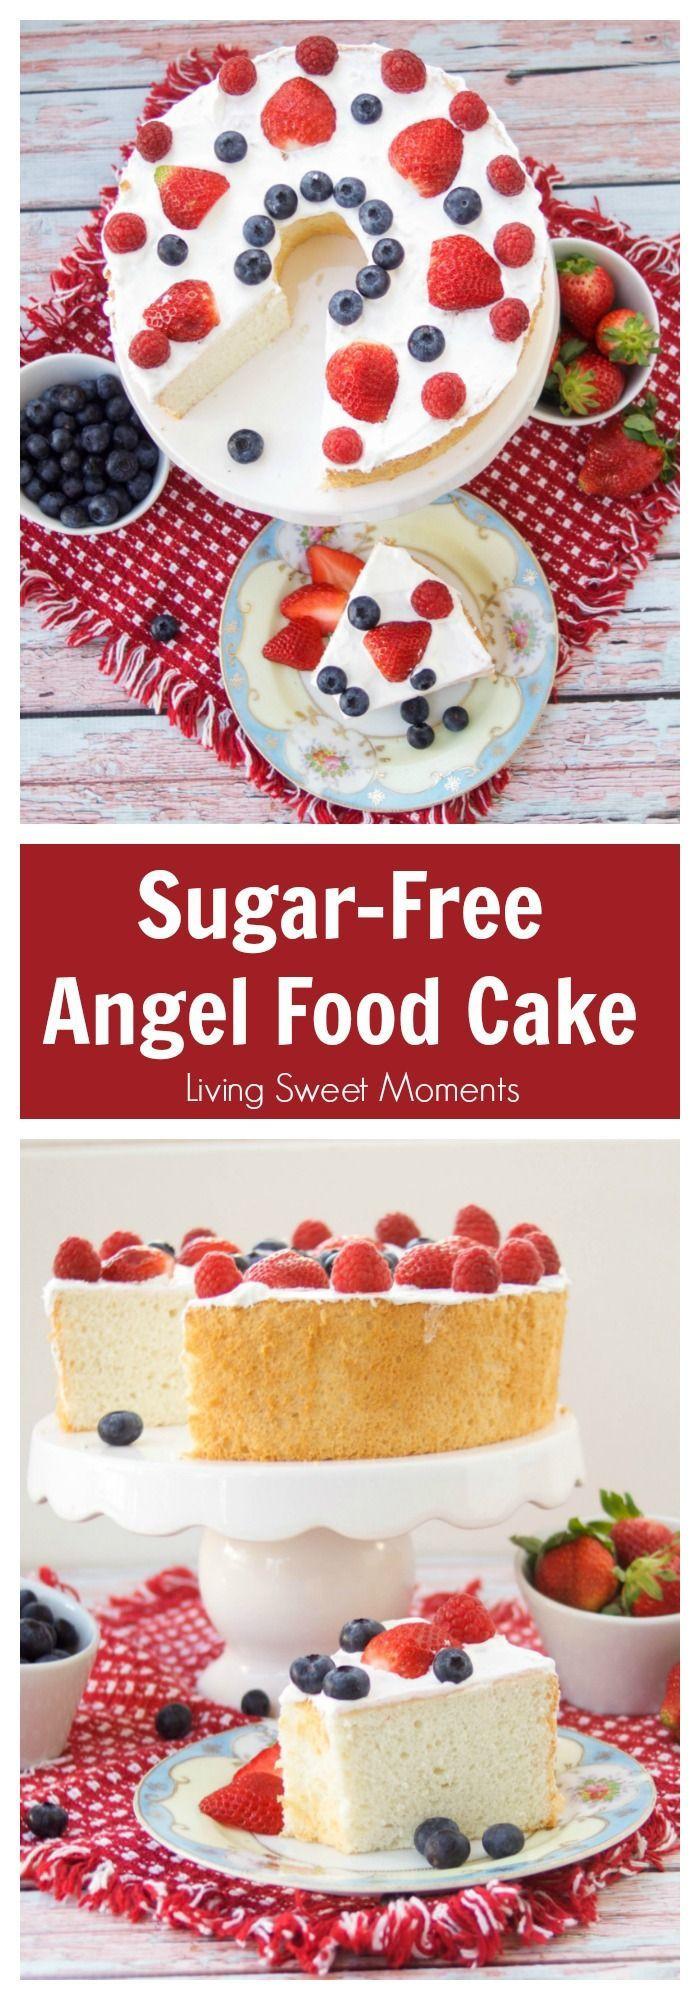 Carbs In Angel Food Cake  Sugar Free Angel Food Cake Recipe